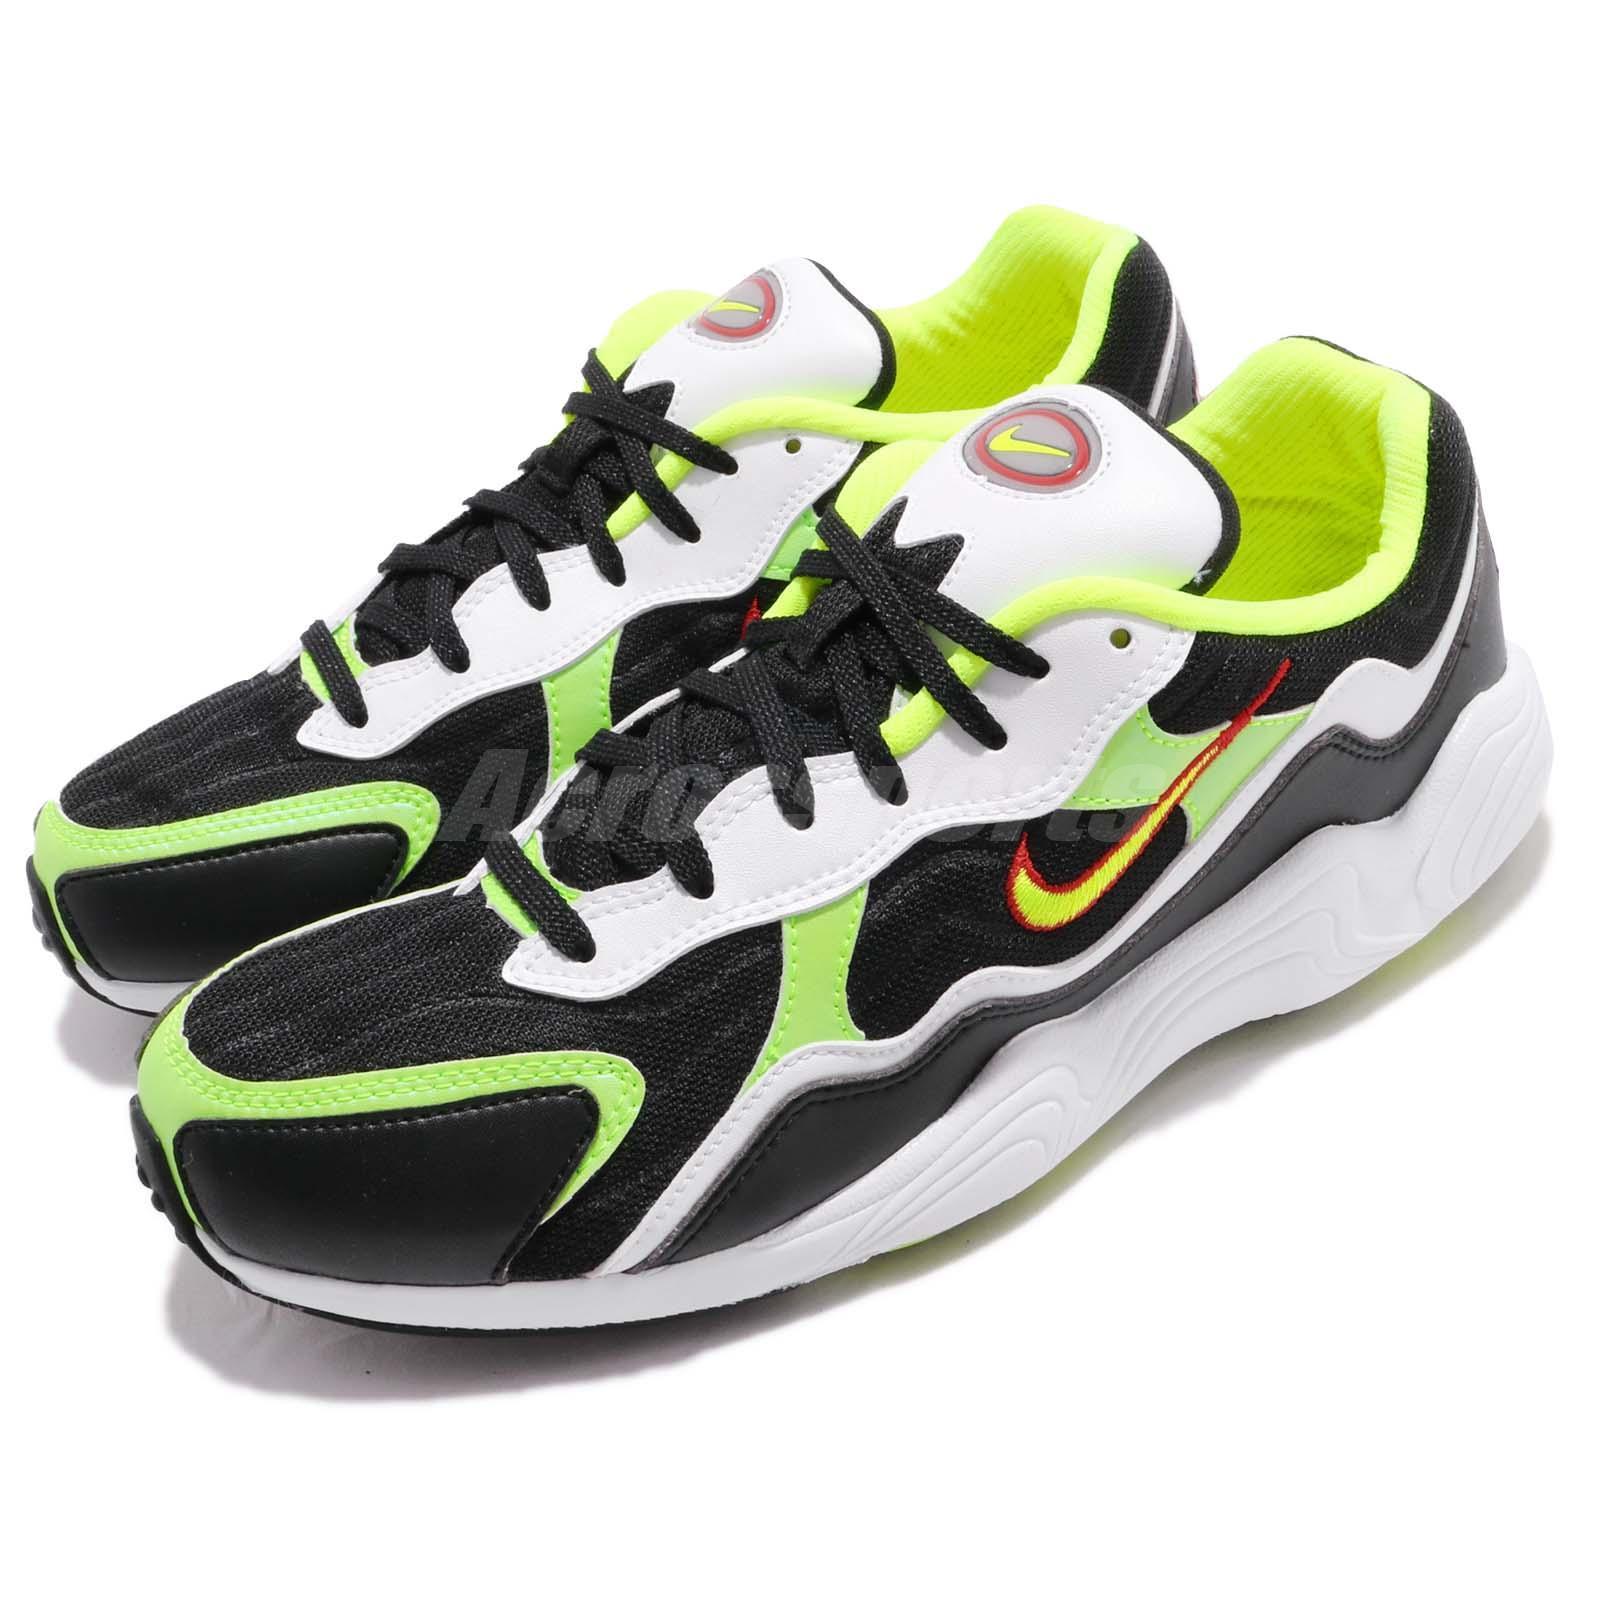 the best attitude f2da4 3eb83 Details about Nike Air Zoom Alpha Black Volt Mens Retro Running Shoes  BQ8800-003